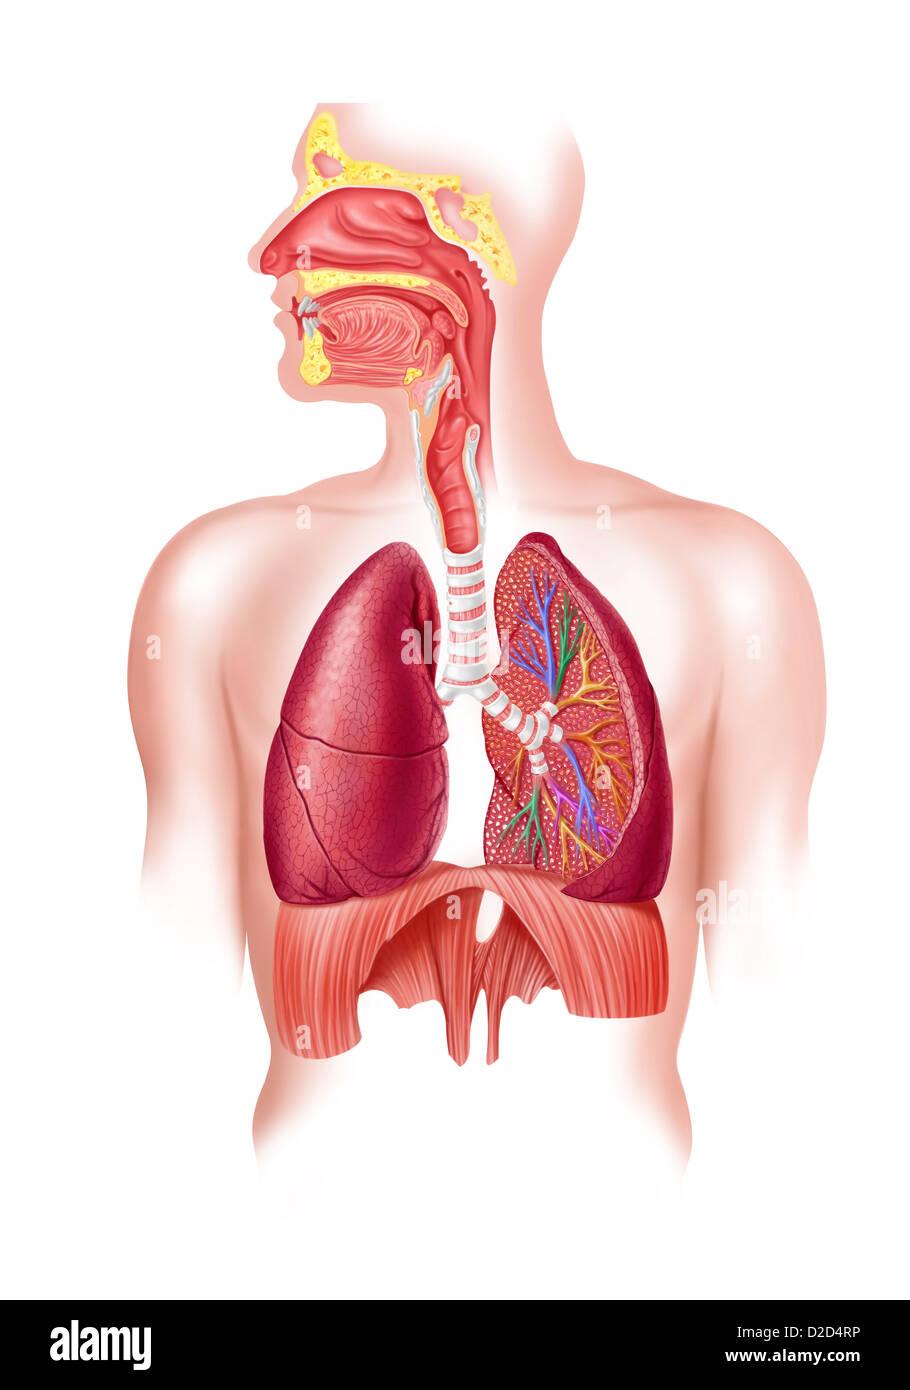 Human respiratory system artwork - Stock Image